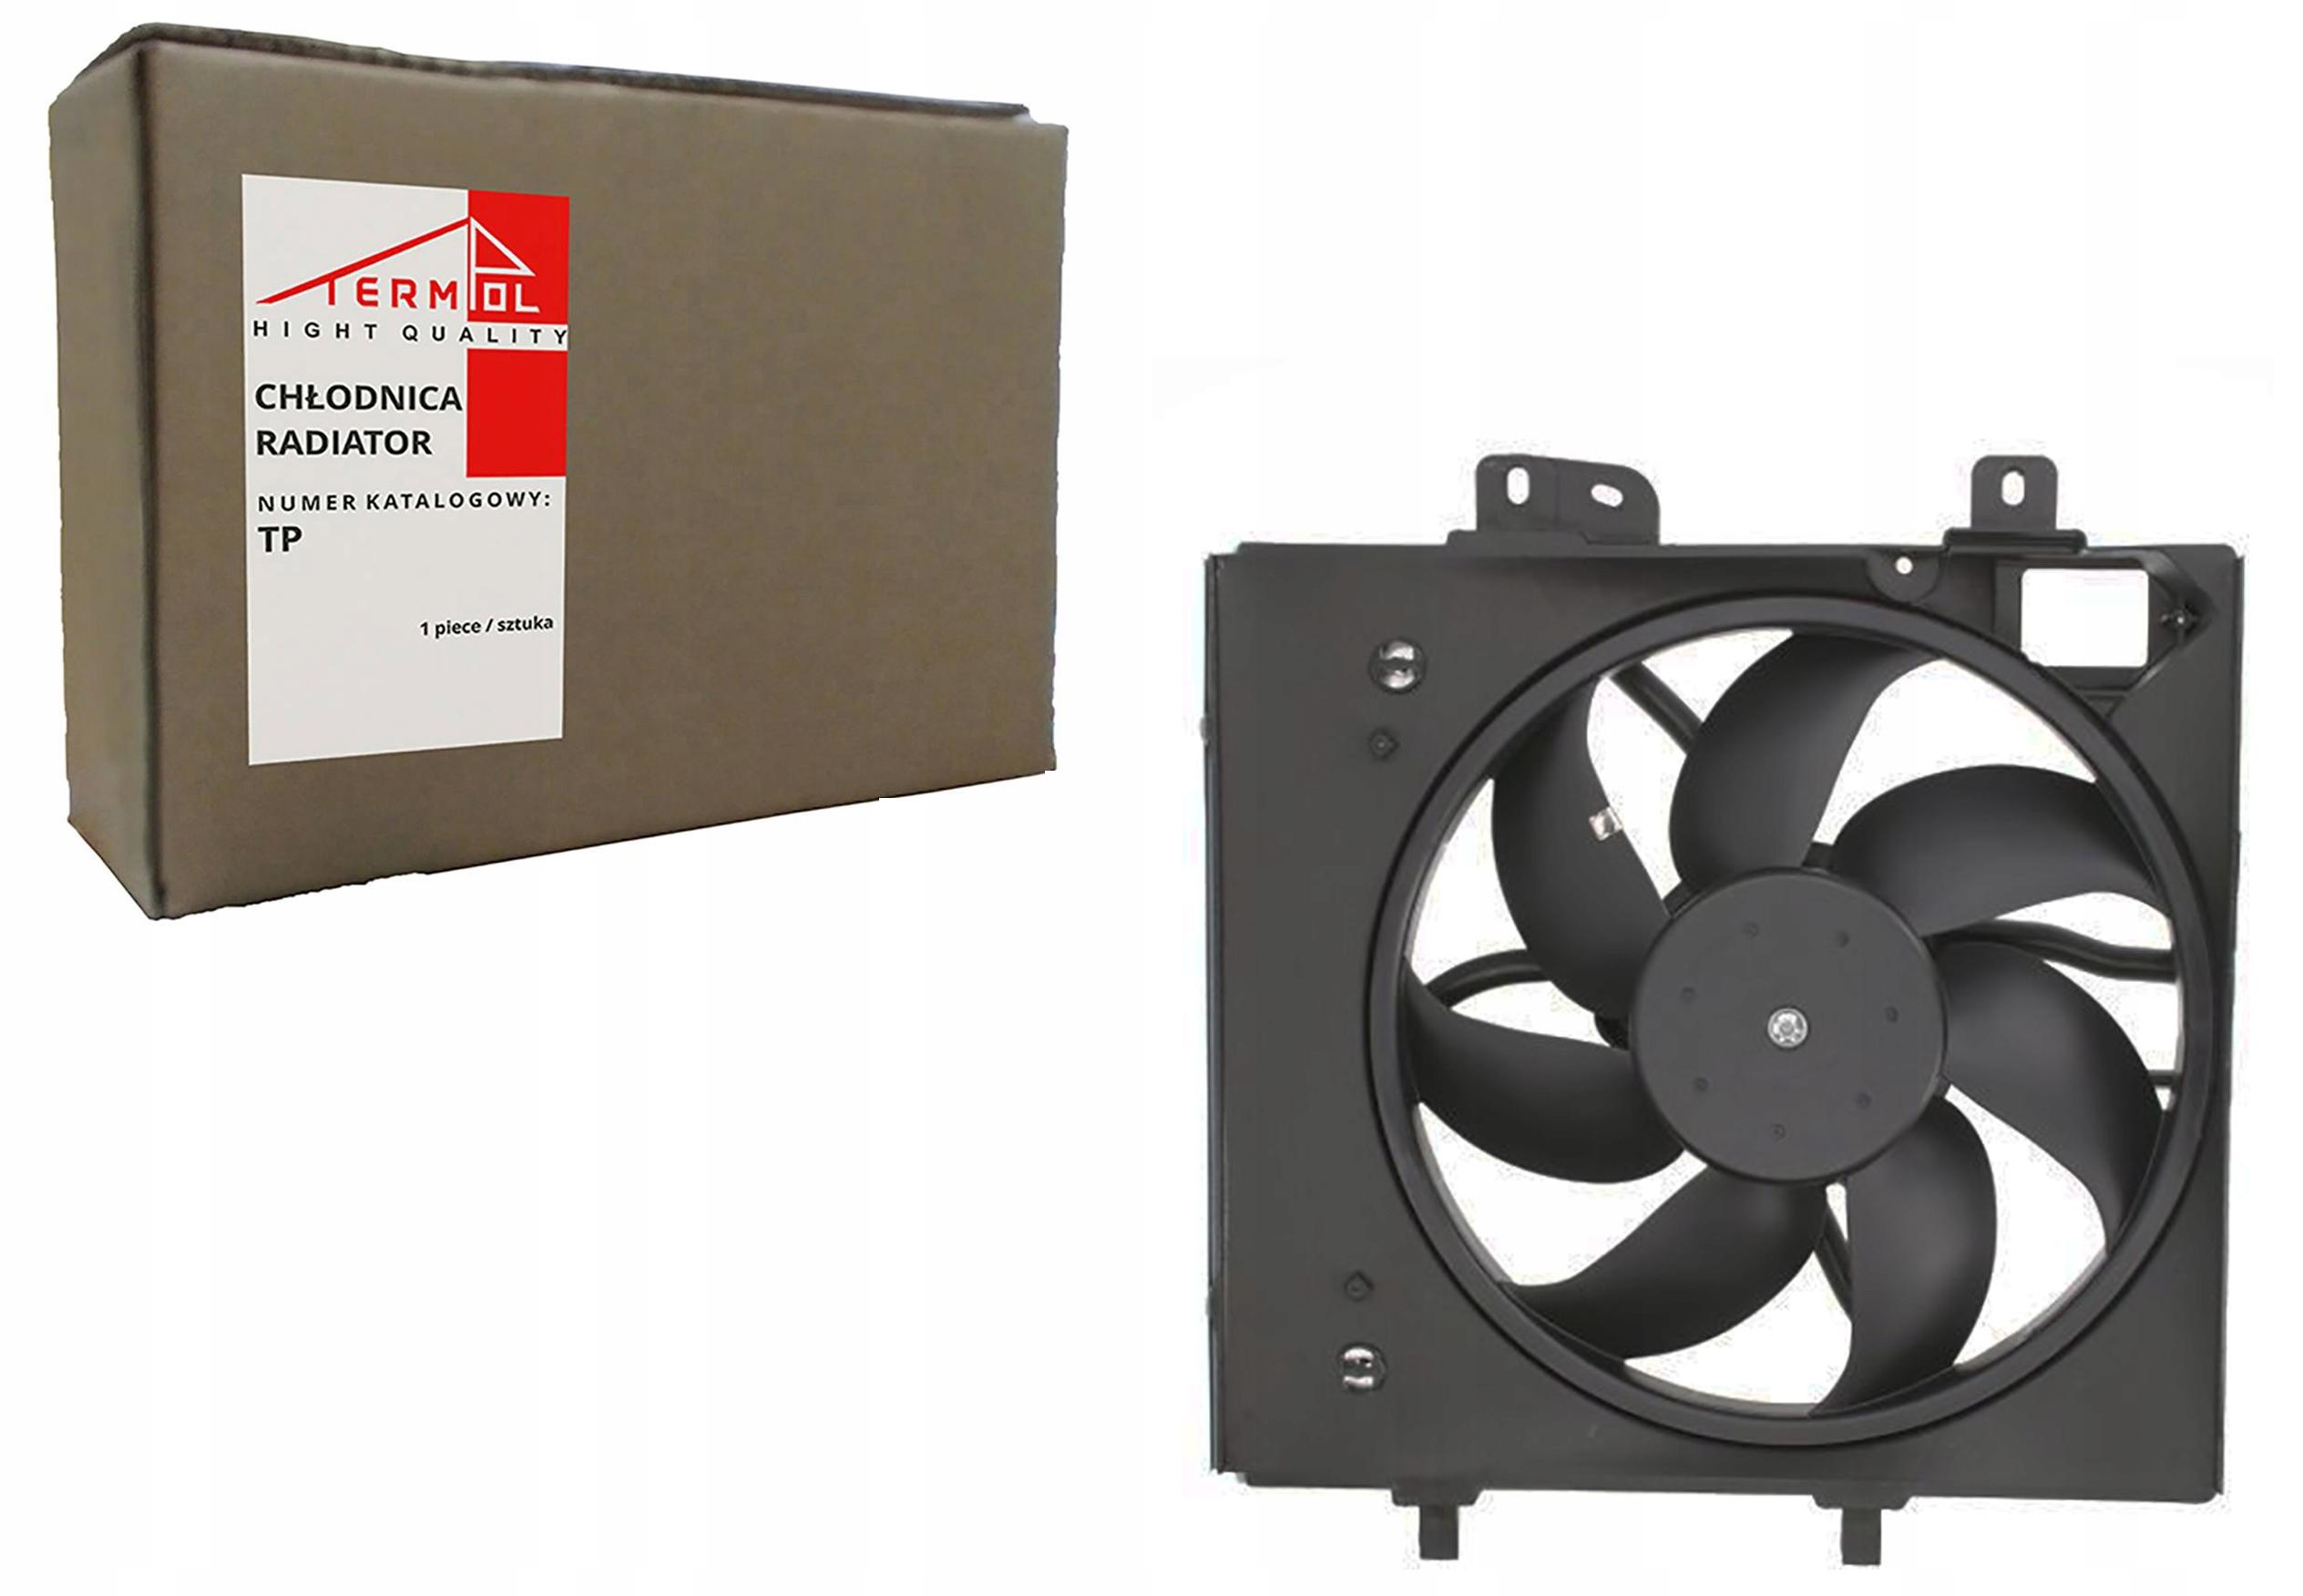 вентилятор радиатора citroen c2 c3 ds3 c4 после 2002-